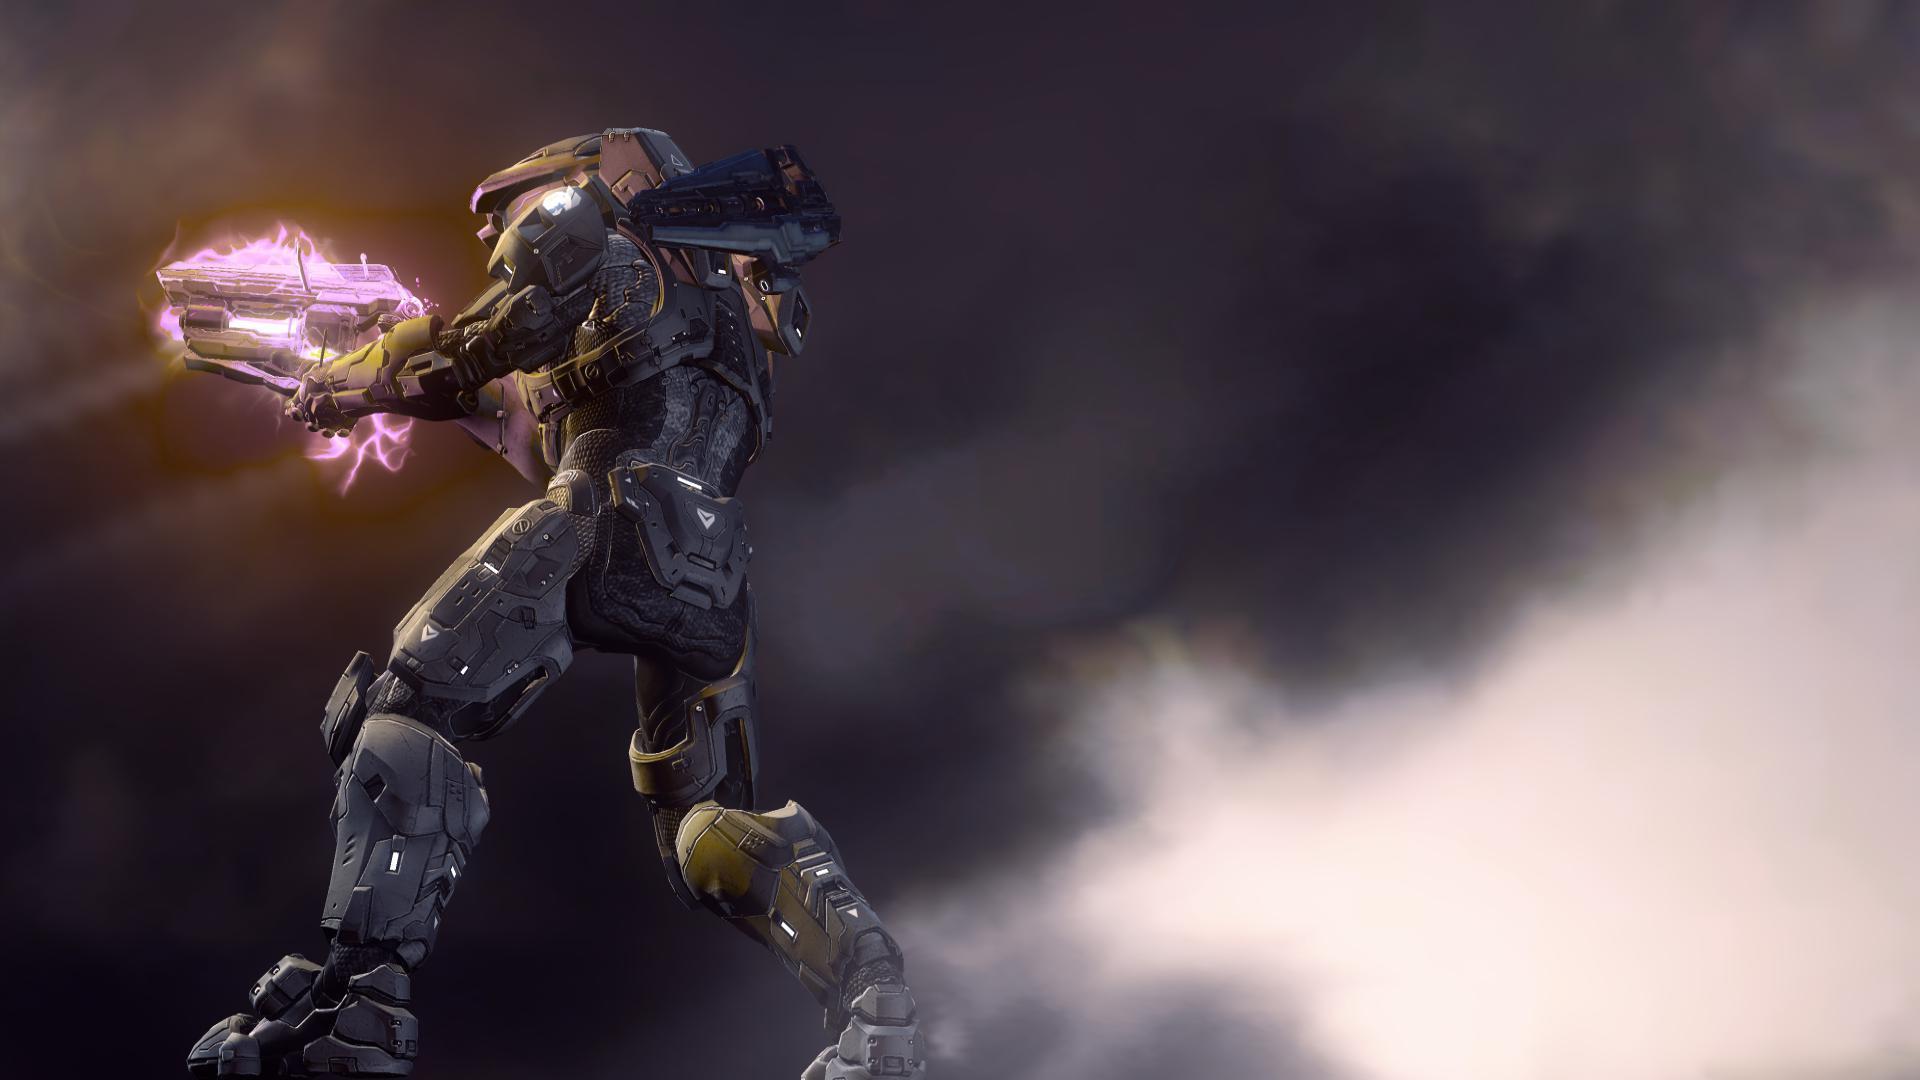 Wallpapers Fond Decran Pour Halo 4 Xbox 360 2012